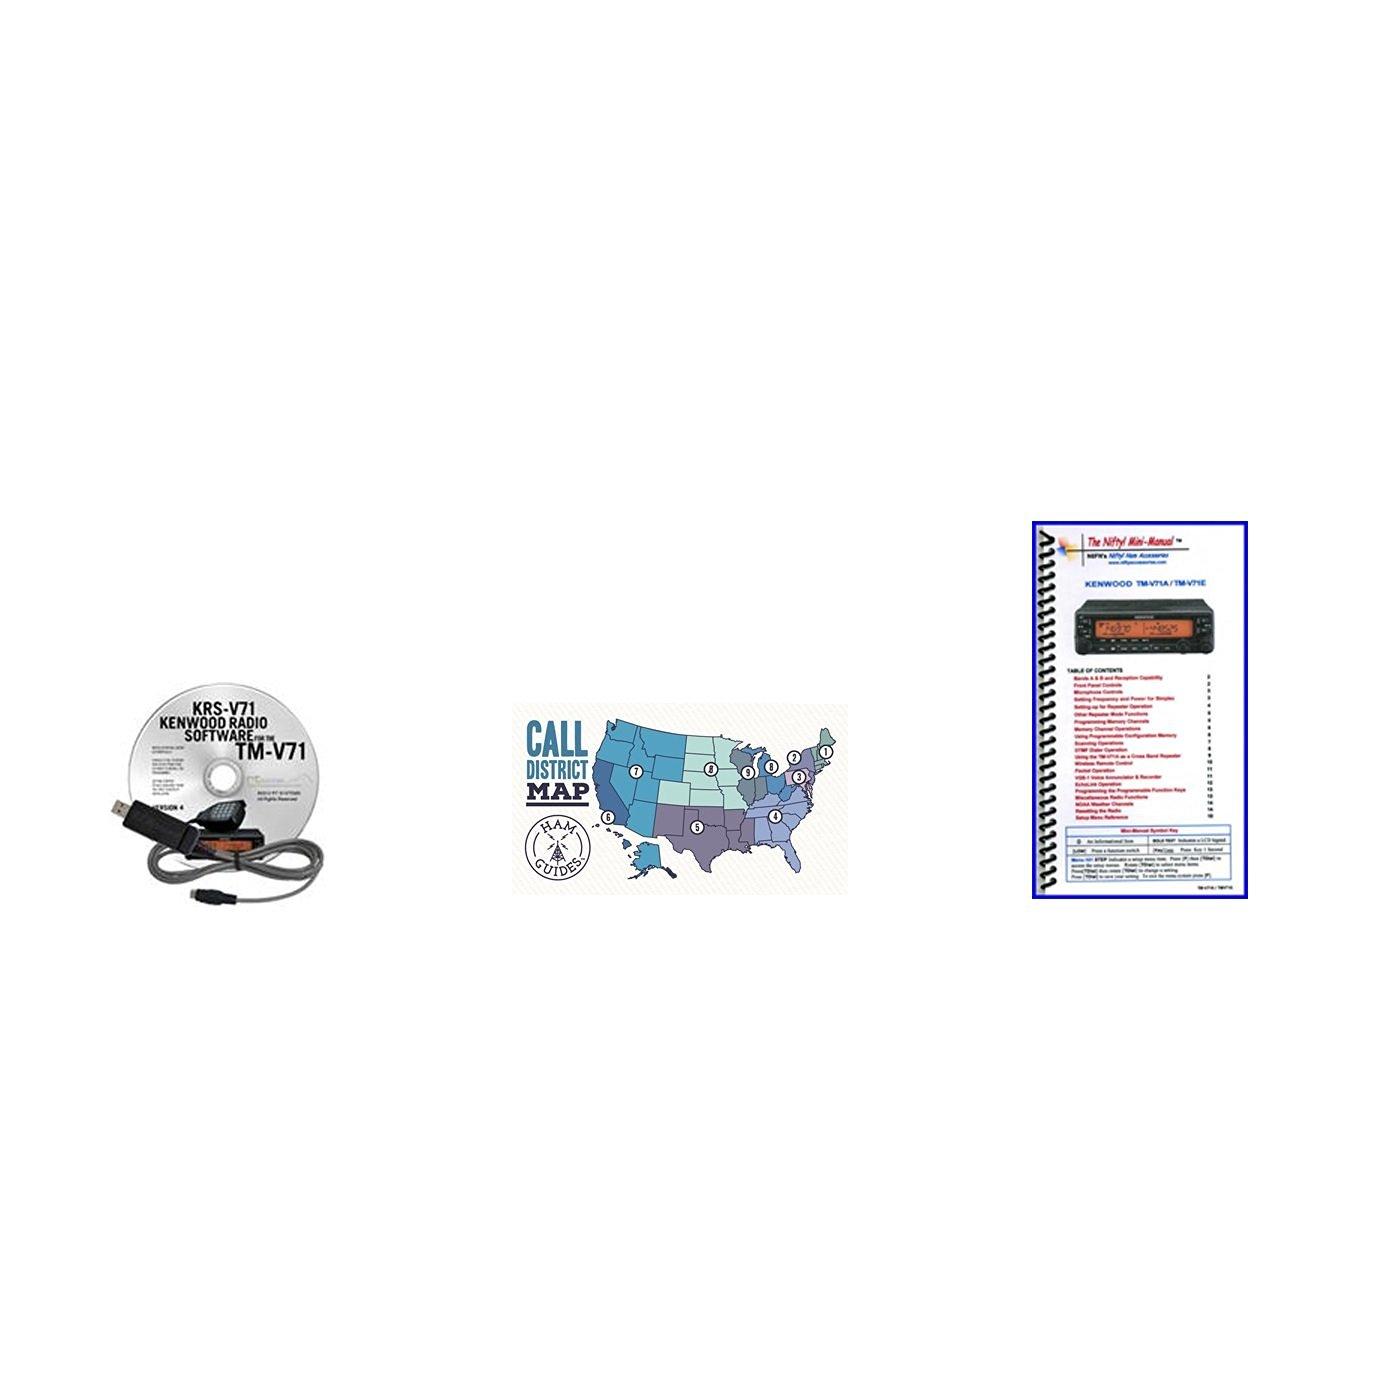 Buy Kenwood TM-V71A Accessory Pack Bundle - - Programming